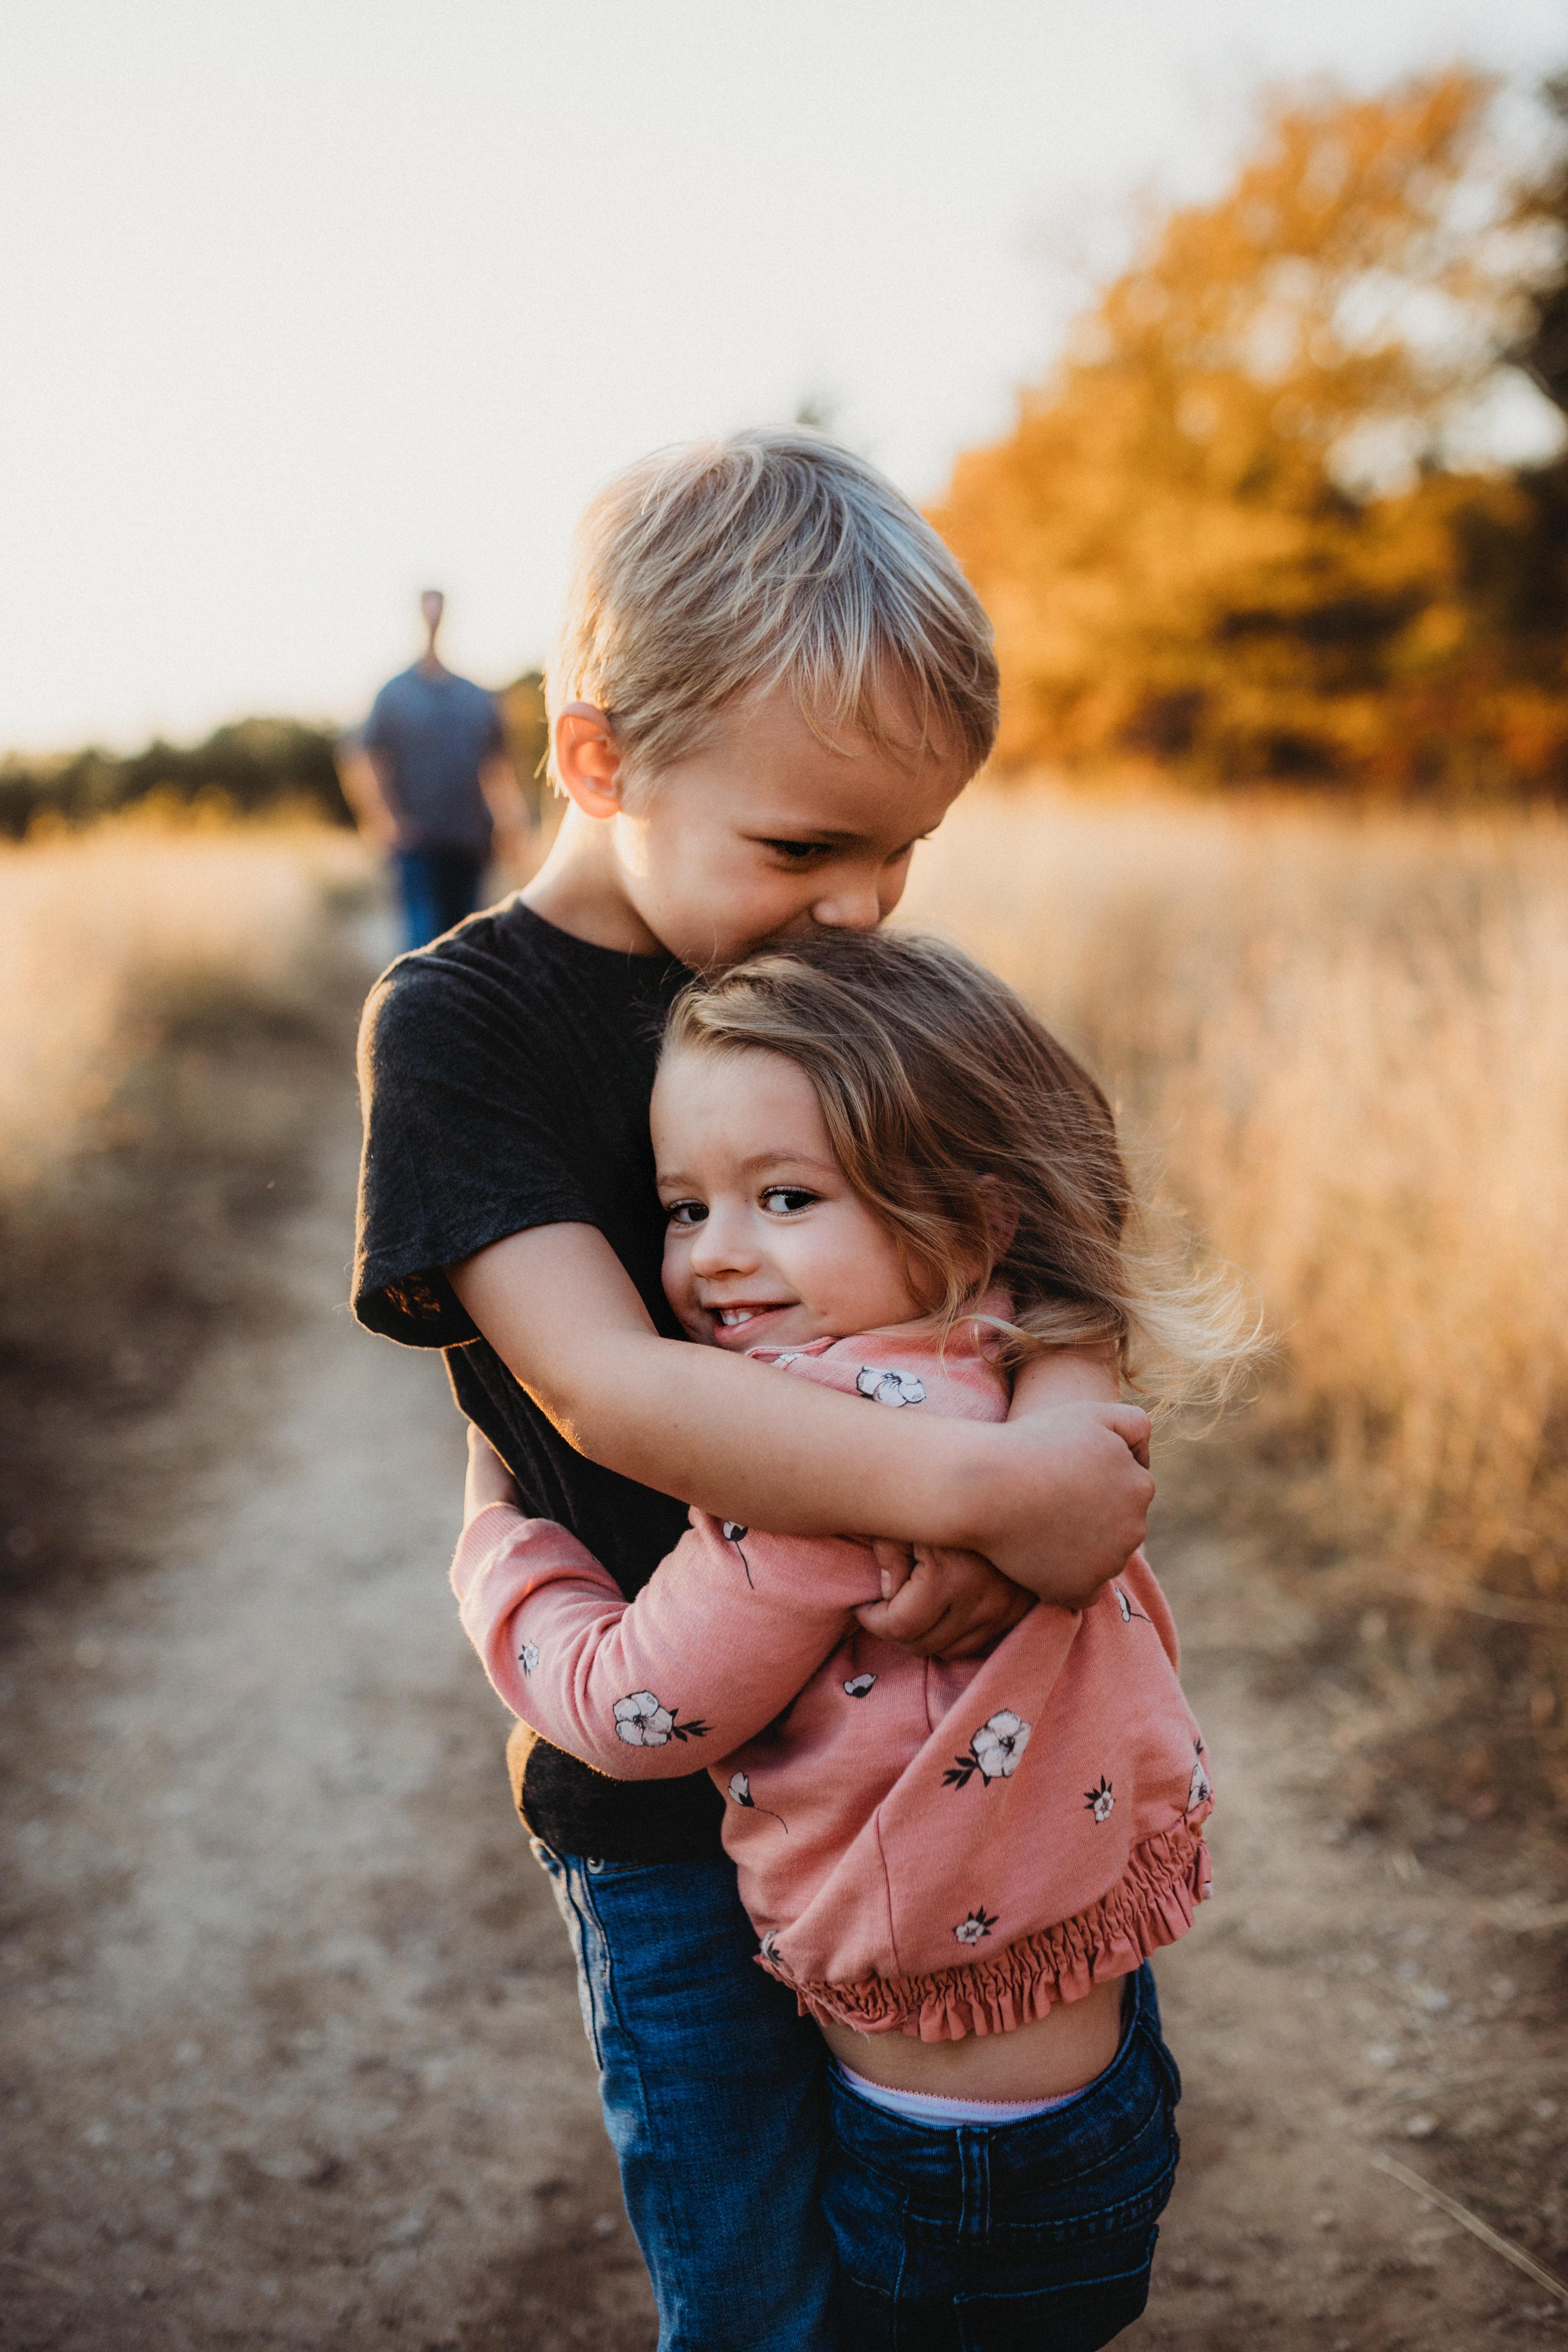 Young siblings hugging in wheat field.